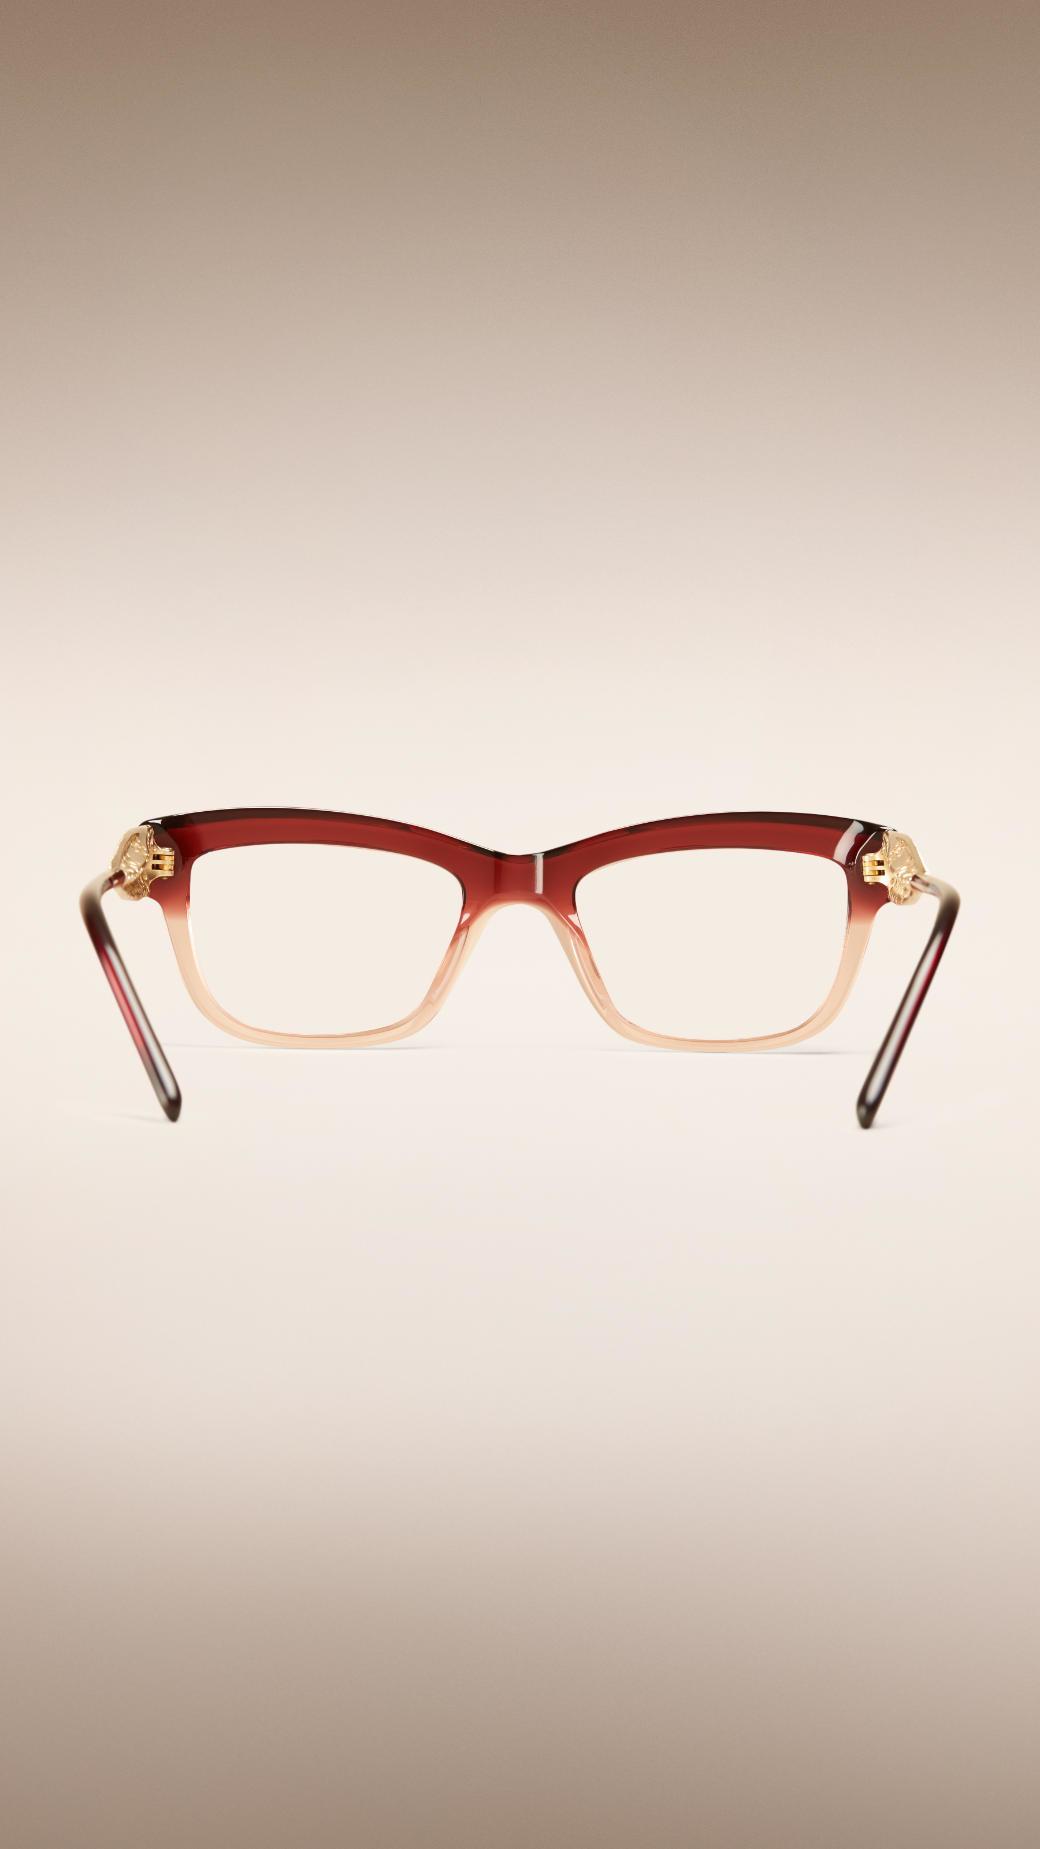 46ac3a4cbb Lyst - Burberry Gabardine Lace Collection Cat-eye Optical Frames ...